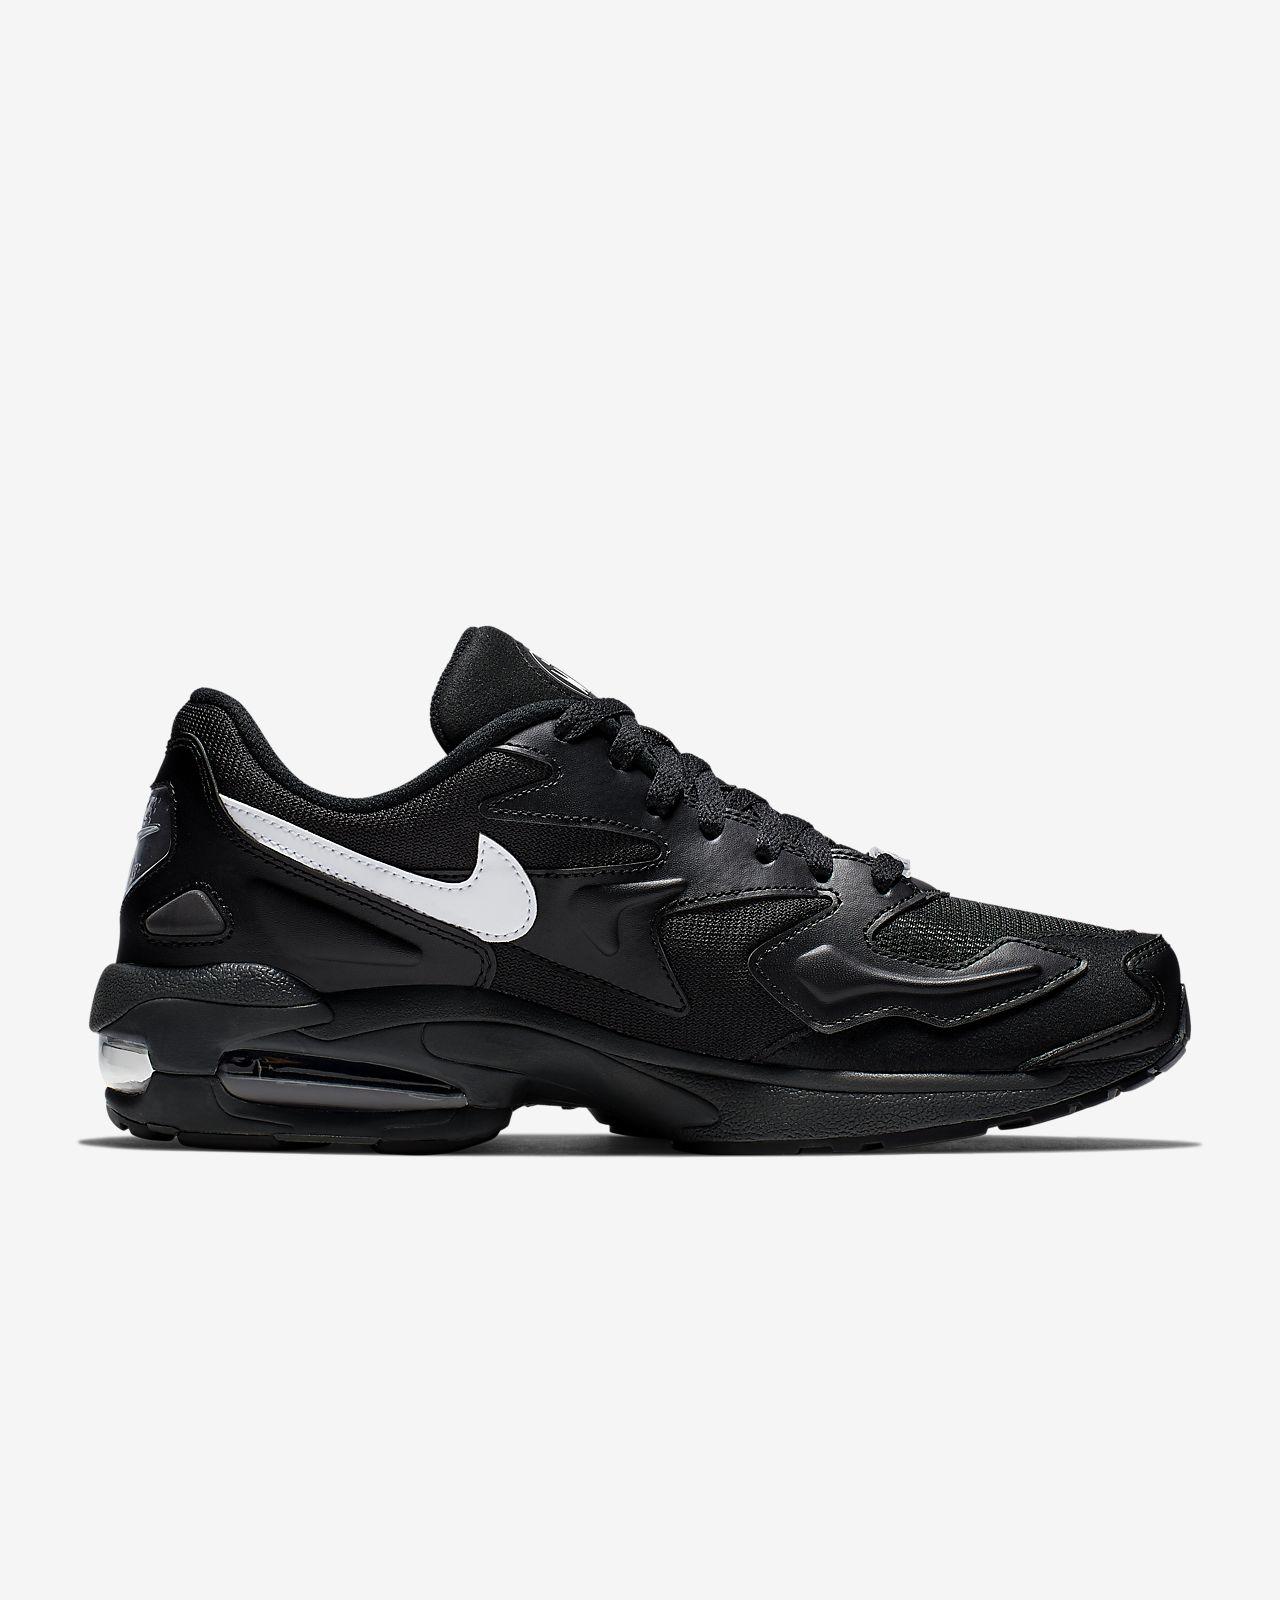 224dbe7cf40f7a Nike Air Max2 Light Men s Shoe. Nike.com AU